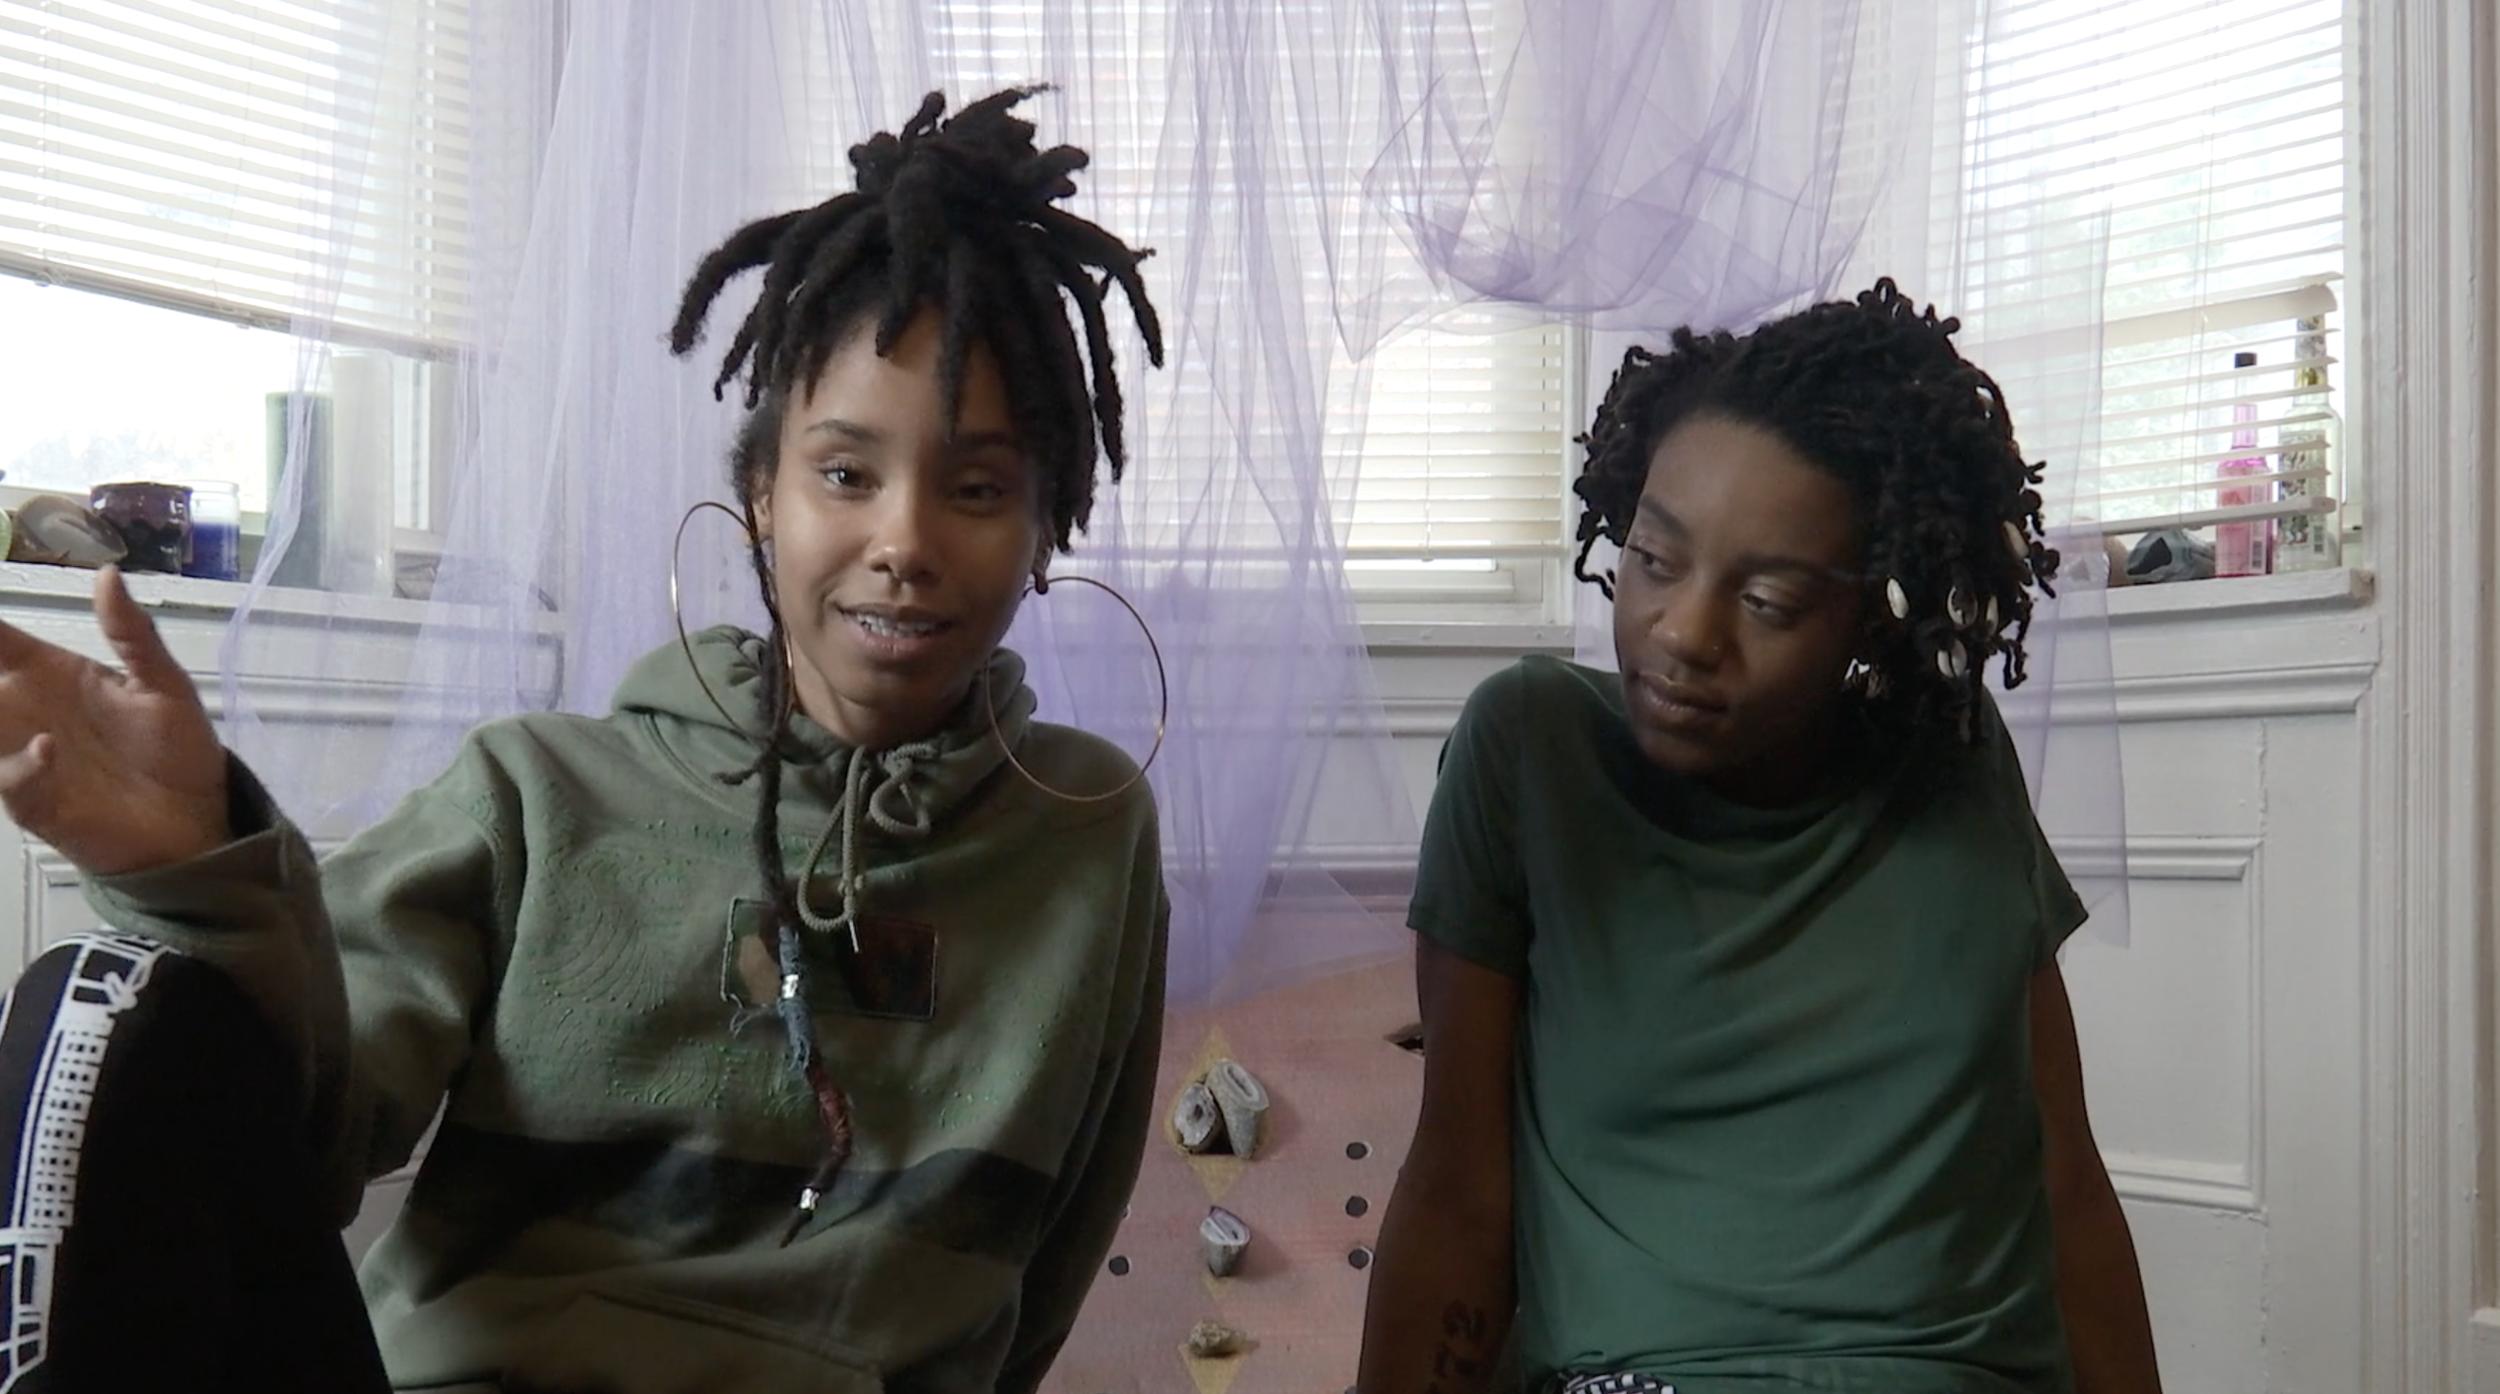 Sankofa: The Story of Oshun   |  Directed by Natalie Harris (USA, 2018, 7:22 min.)